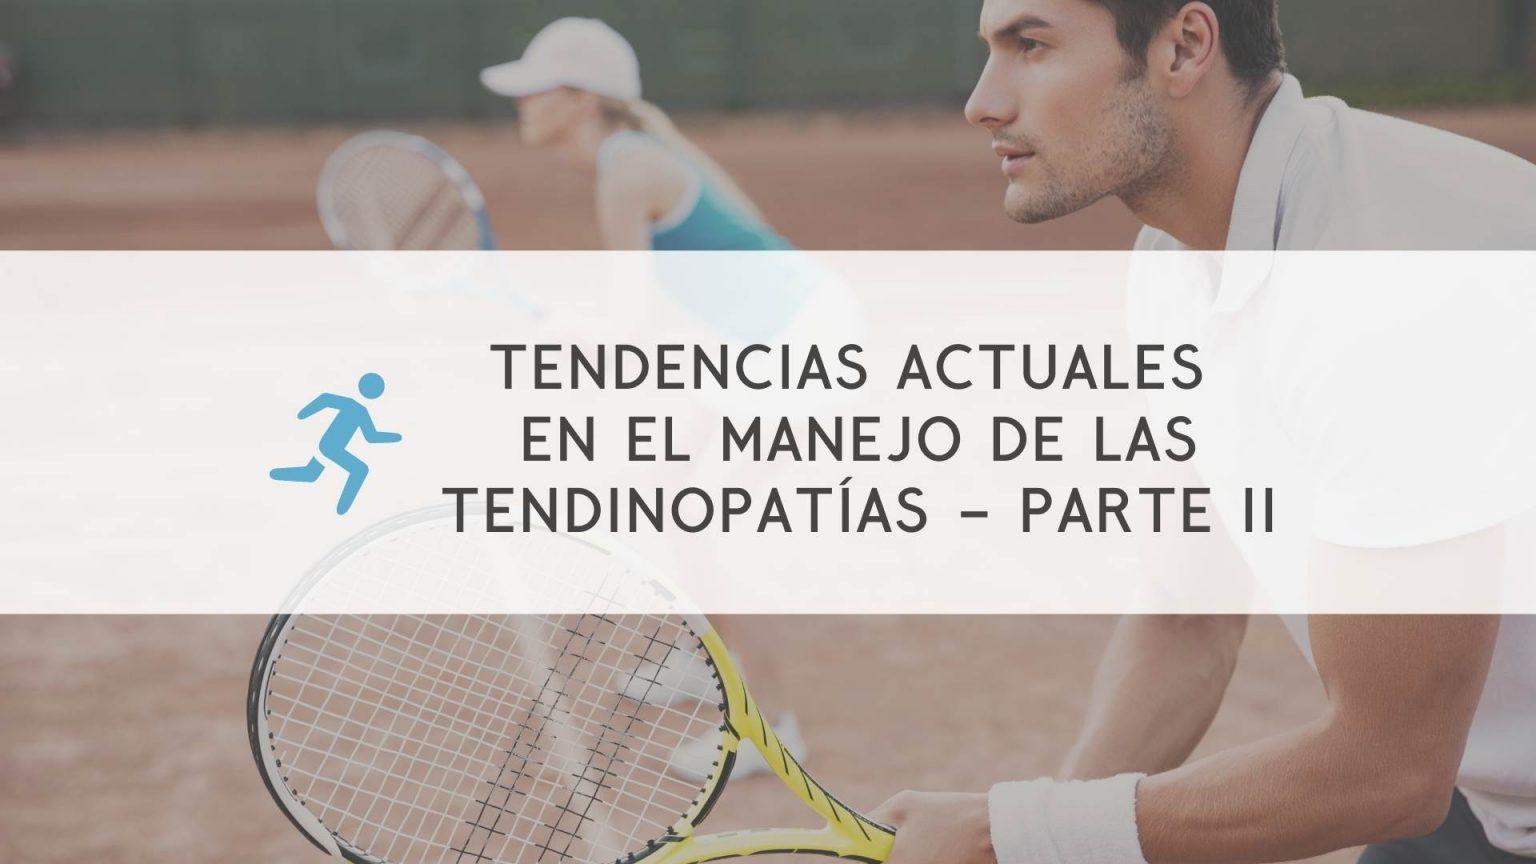 masterclass-tendencias-actuales-manejo-tendinopatias-2